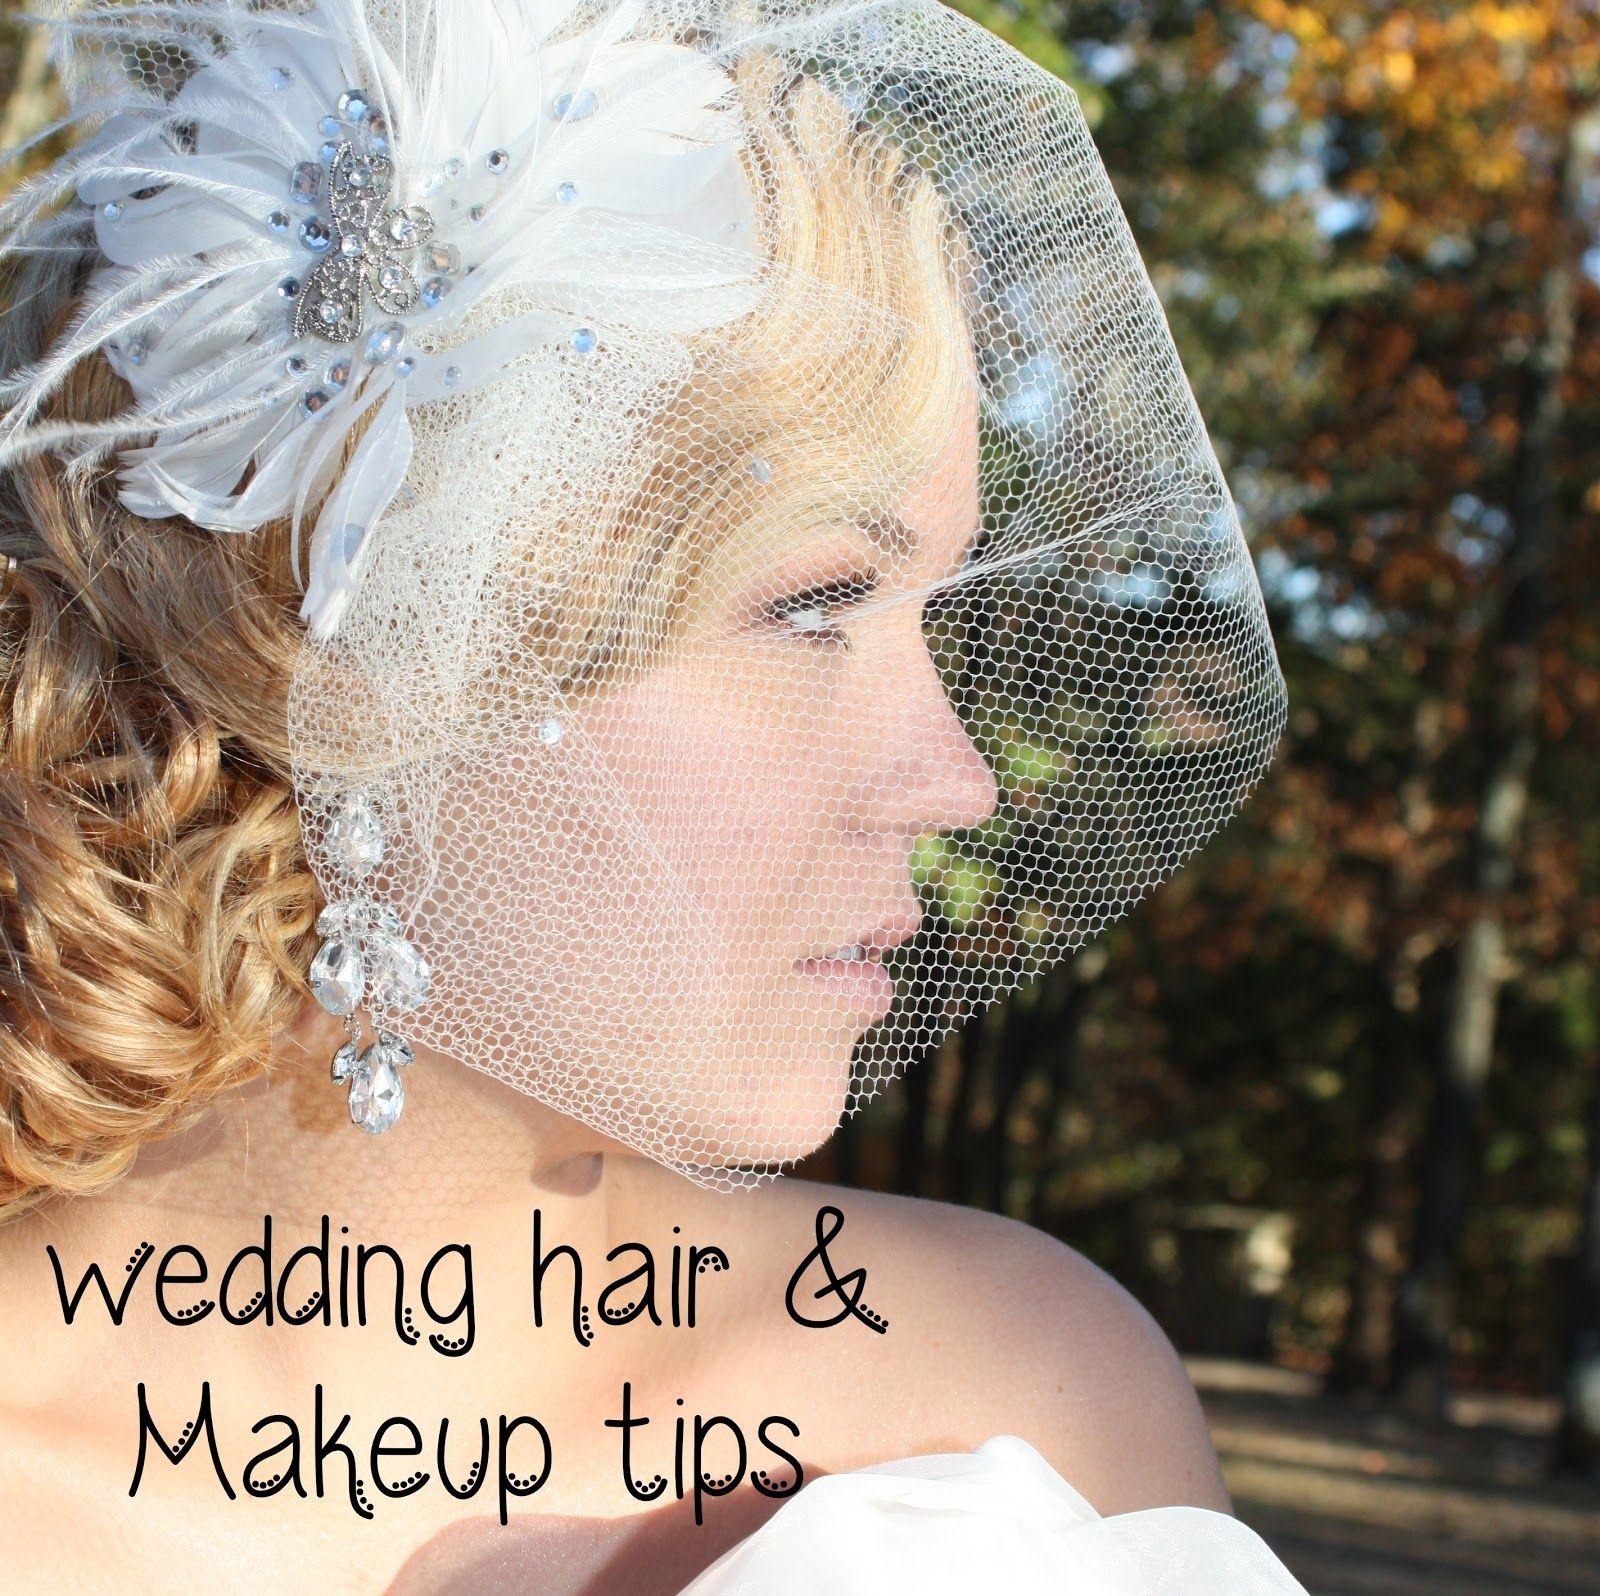 Bridal Hair & Makeup Tips: STEP BY STEP